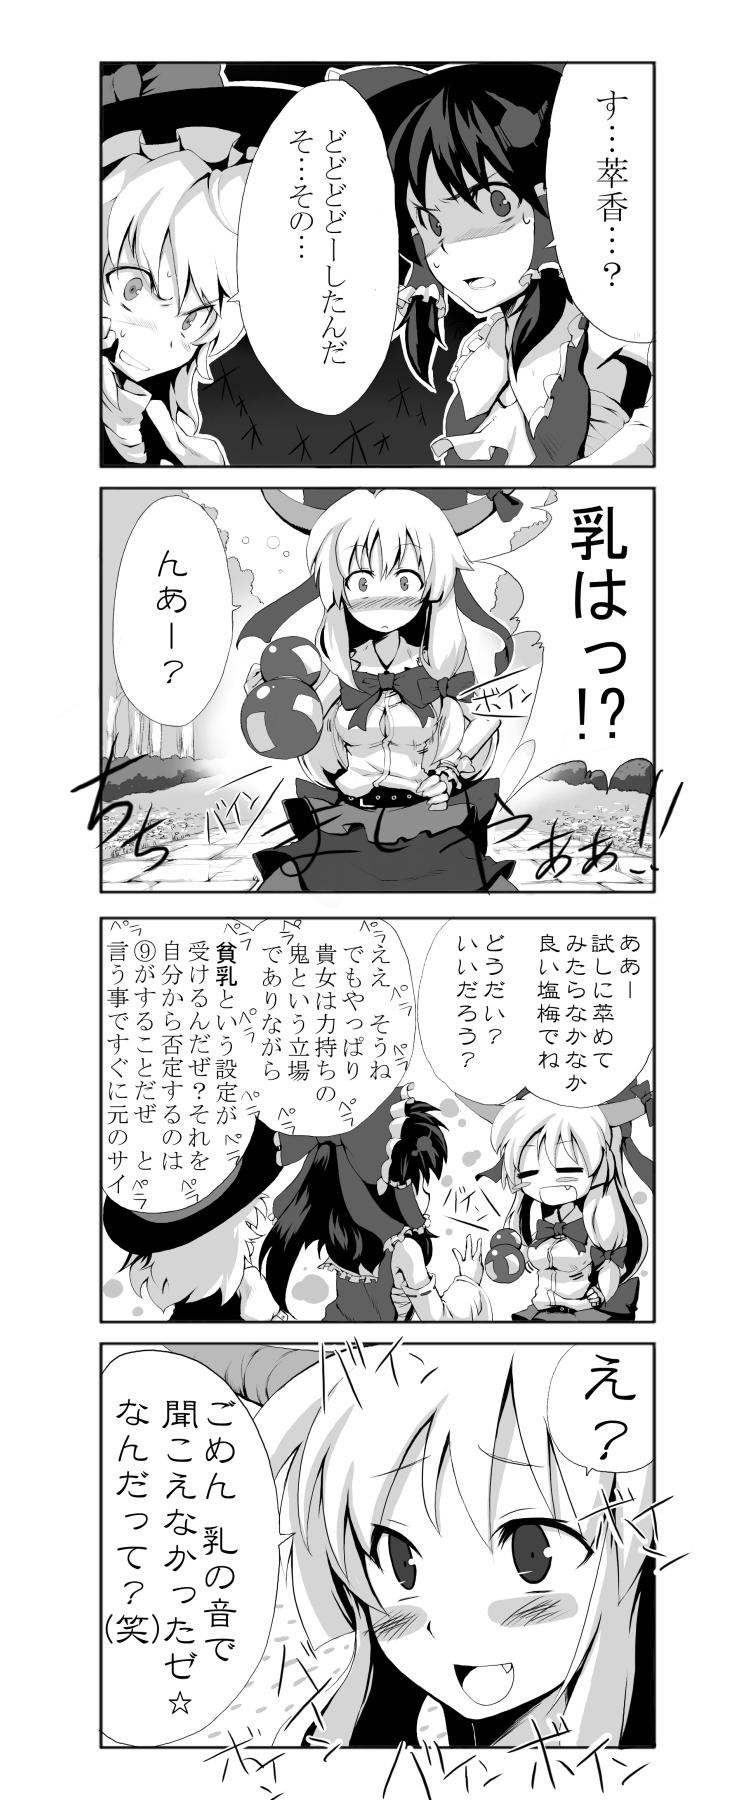 hakurei reimu, ibuki suika, and kirisame marisa (touhou) drawn by morino hon